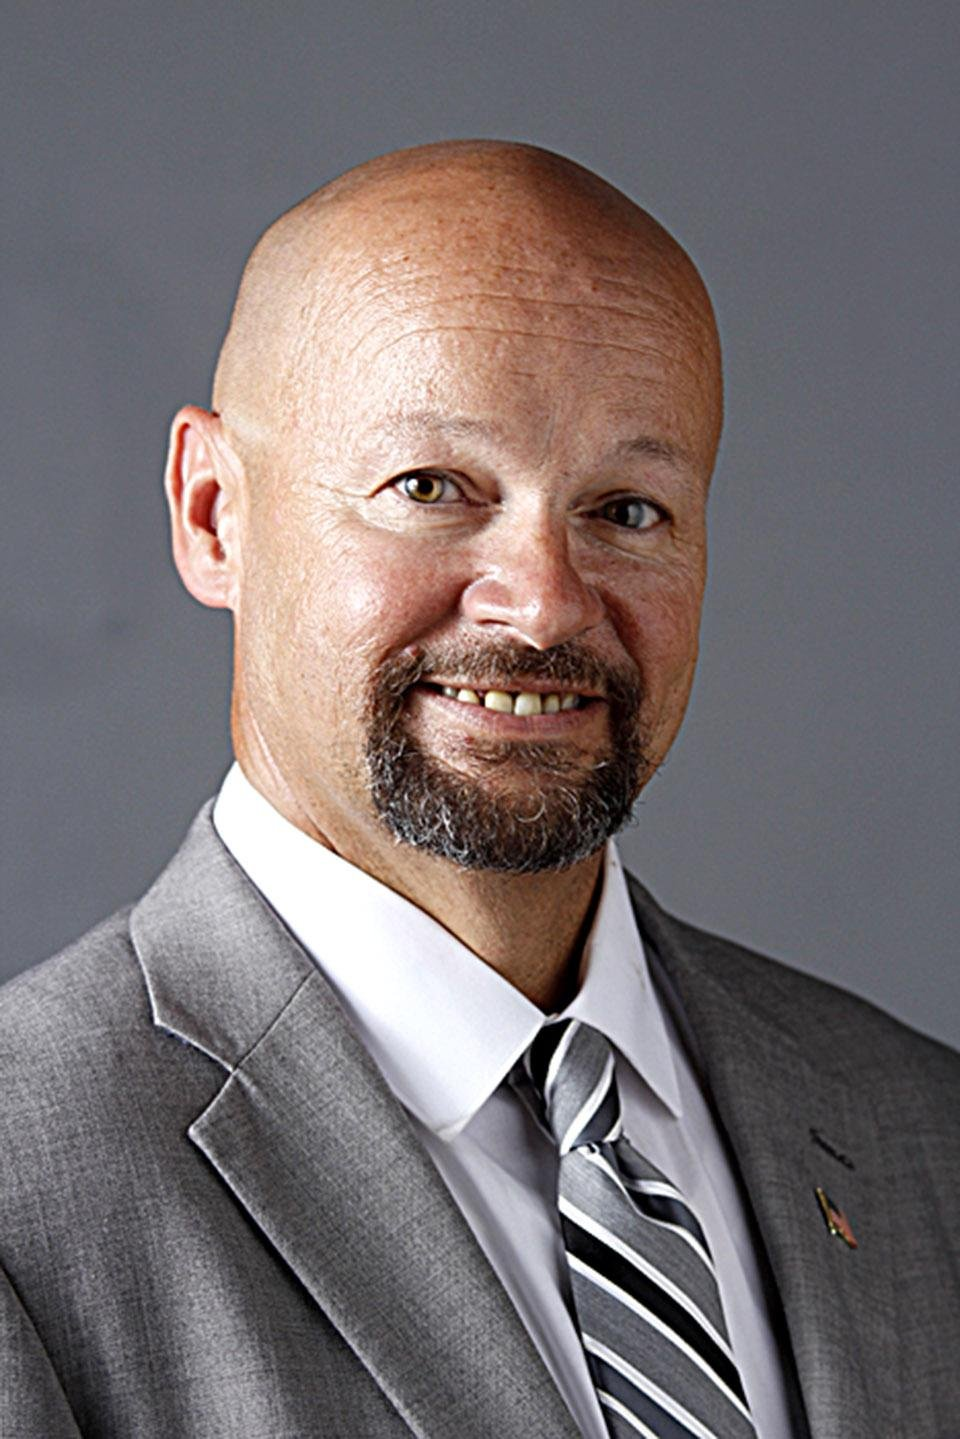 Funding priorities key in Carroll County sheriff's race